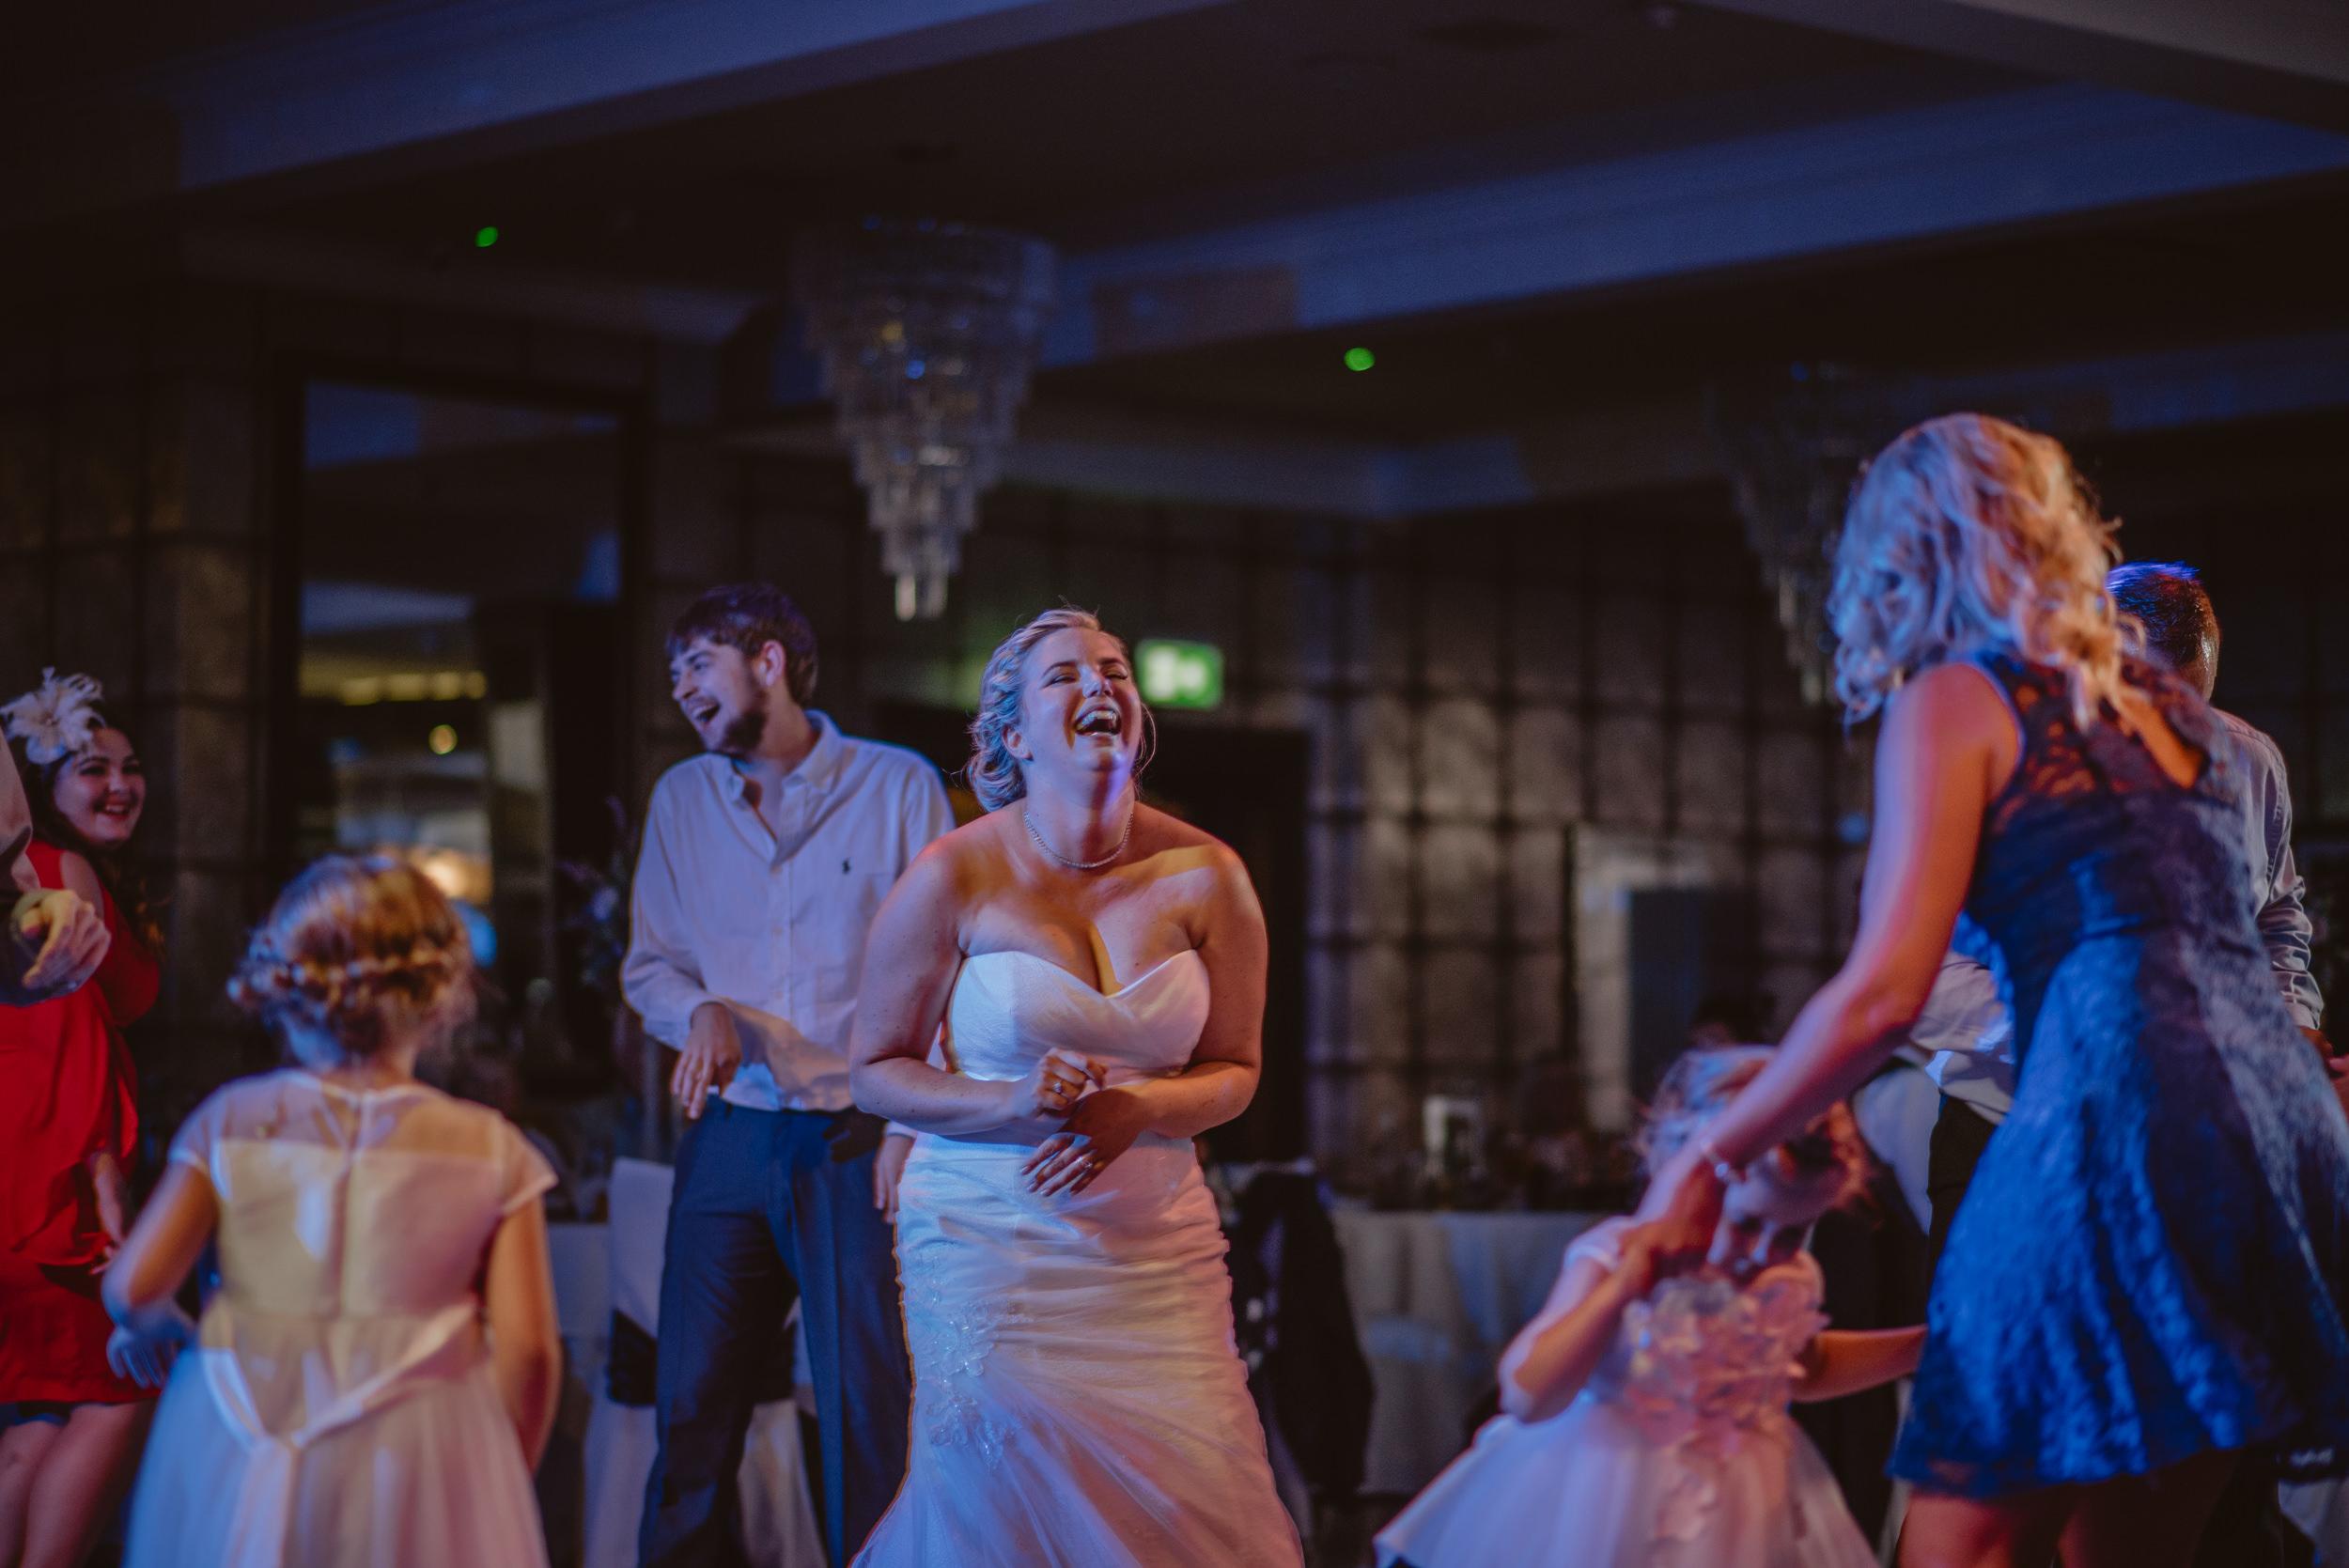 Chantelle-and-Stephen-Old-Thorns-Hotel-Wedding-Liphook-Manu-Mendoza-Wedding-Photography-584.jpg